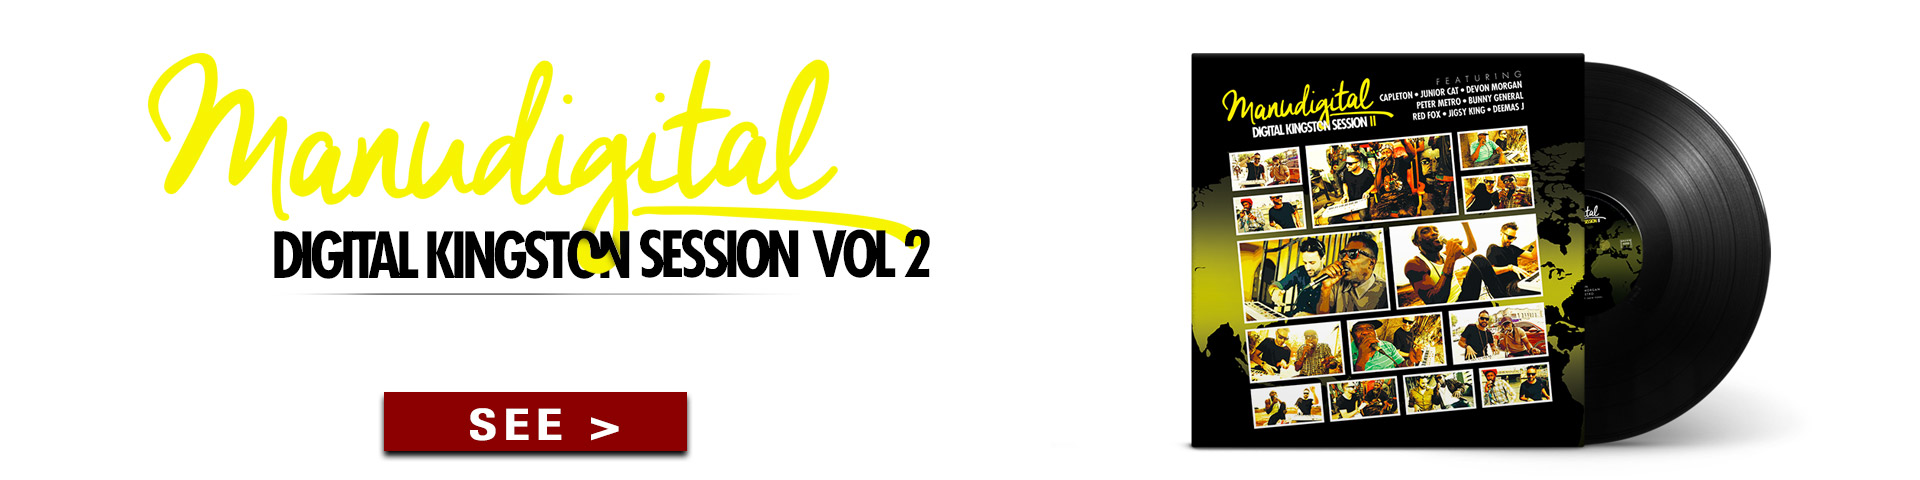 manudigital-digital-kingston-session-vol-2-vinyl